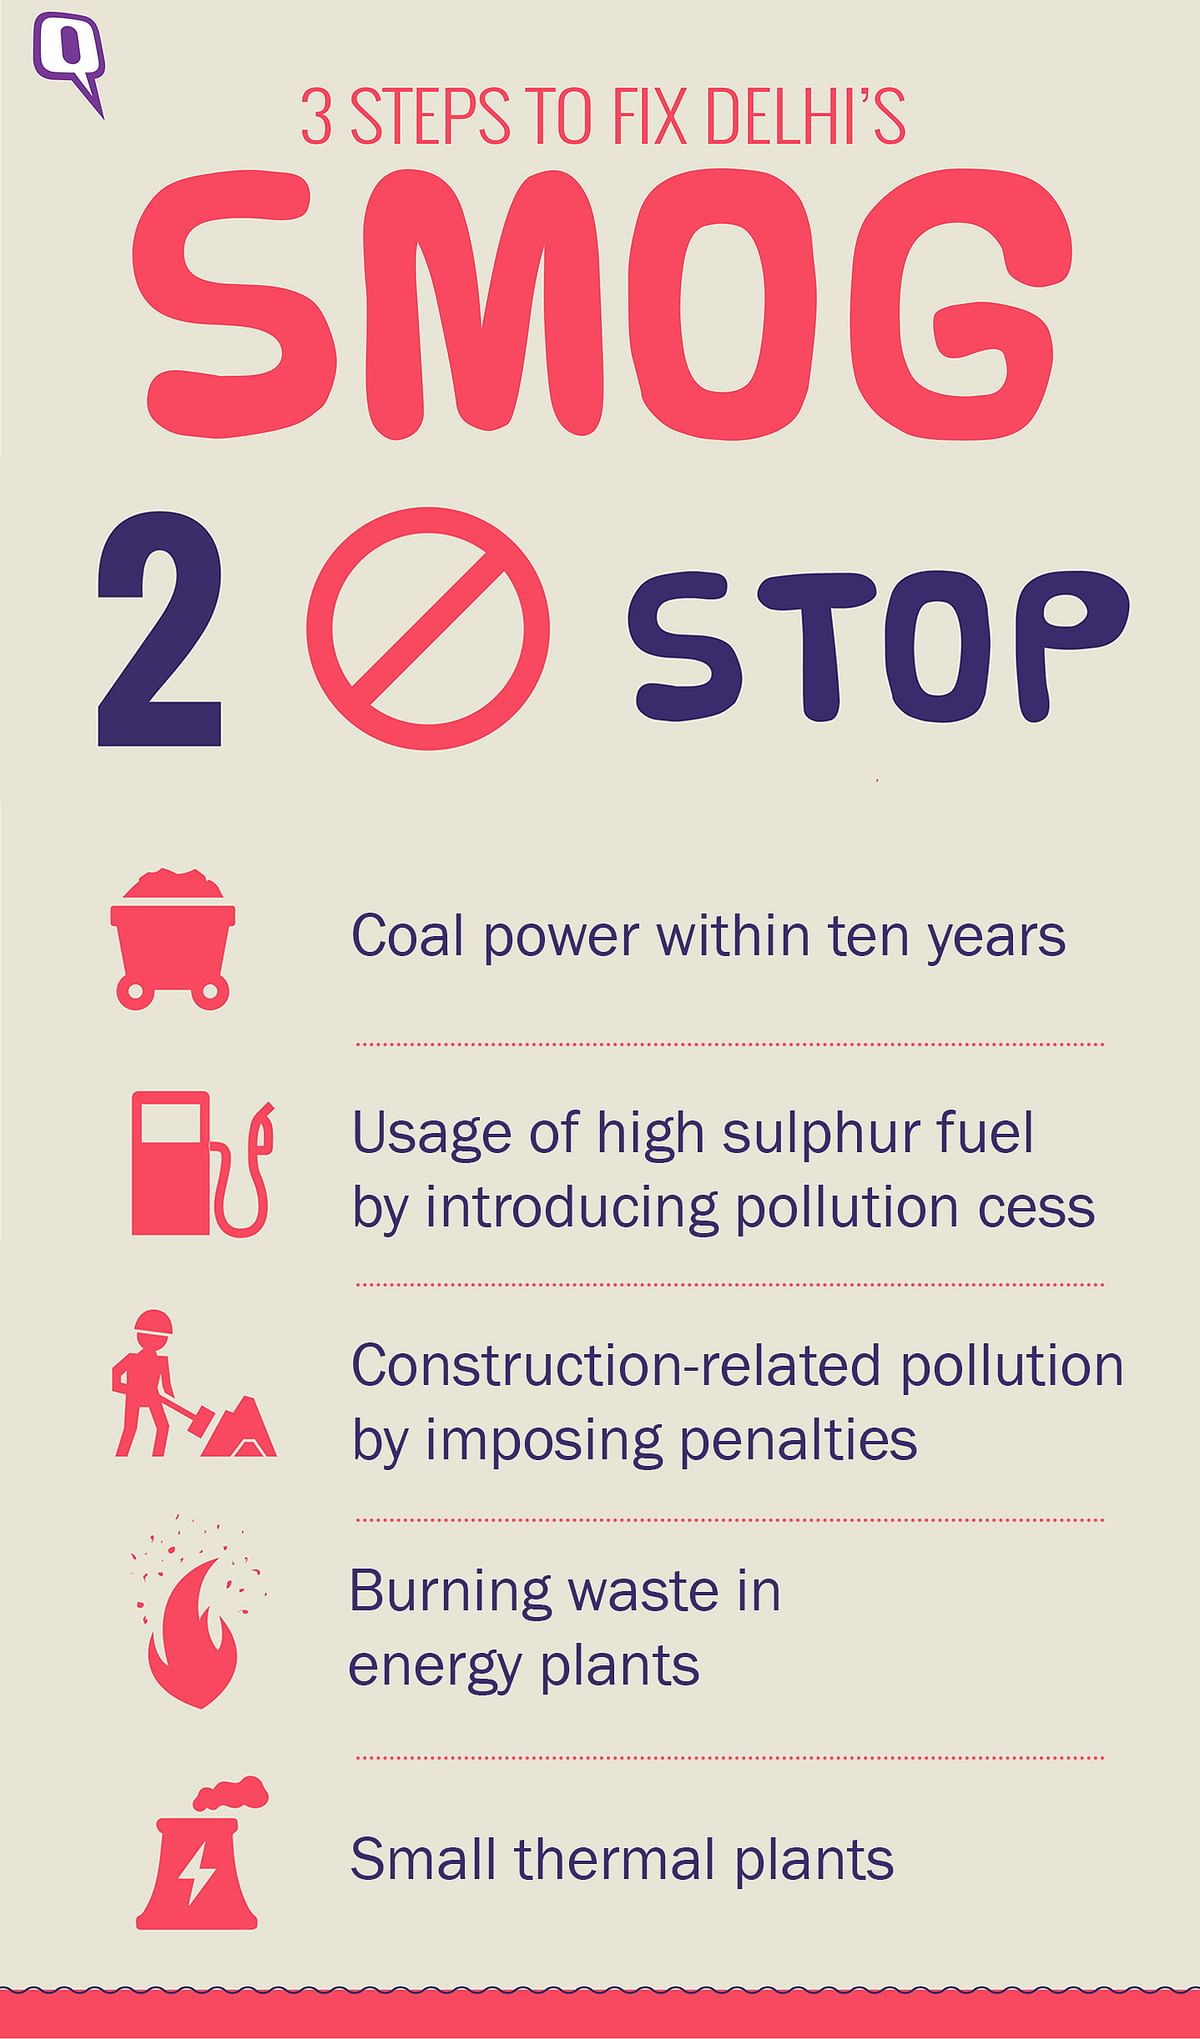 Here's a 3-Step Guide For Getting Through Delhi's Smog Problem